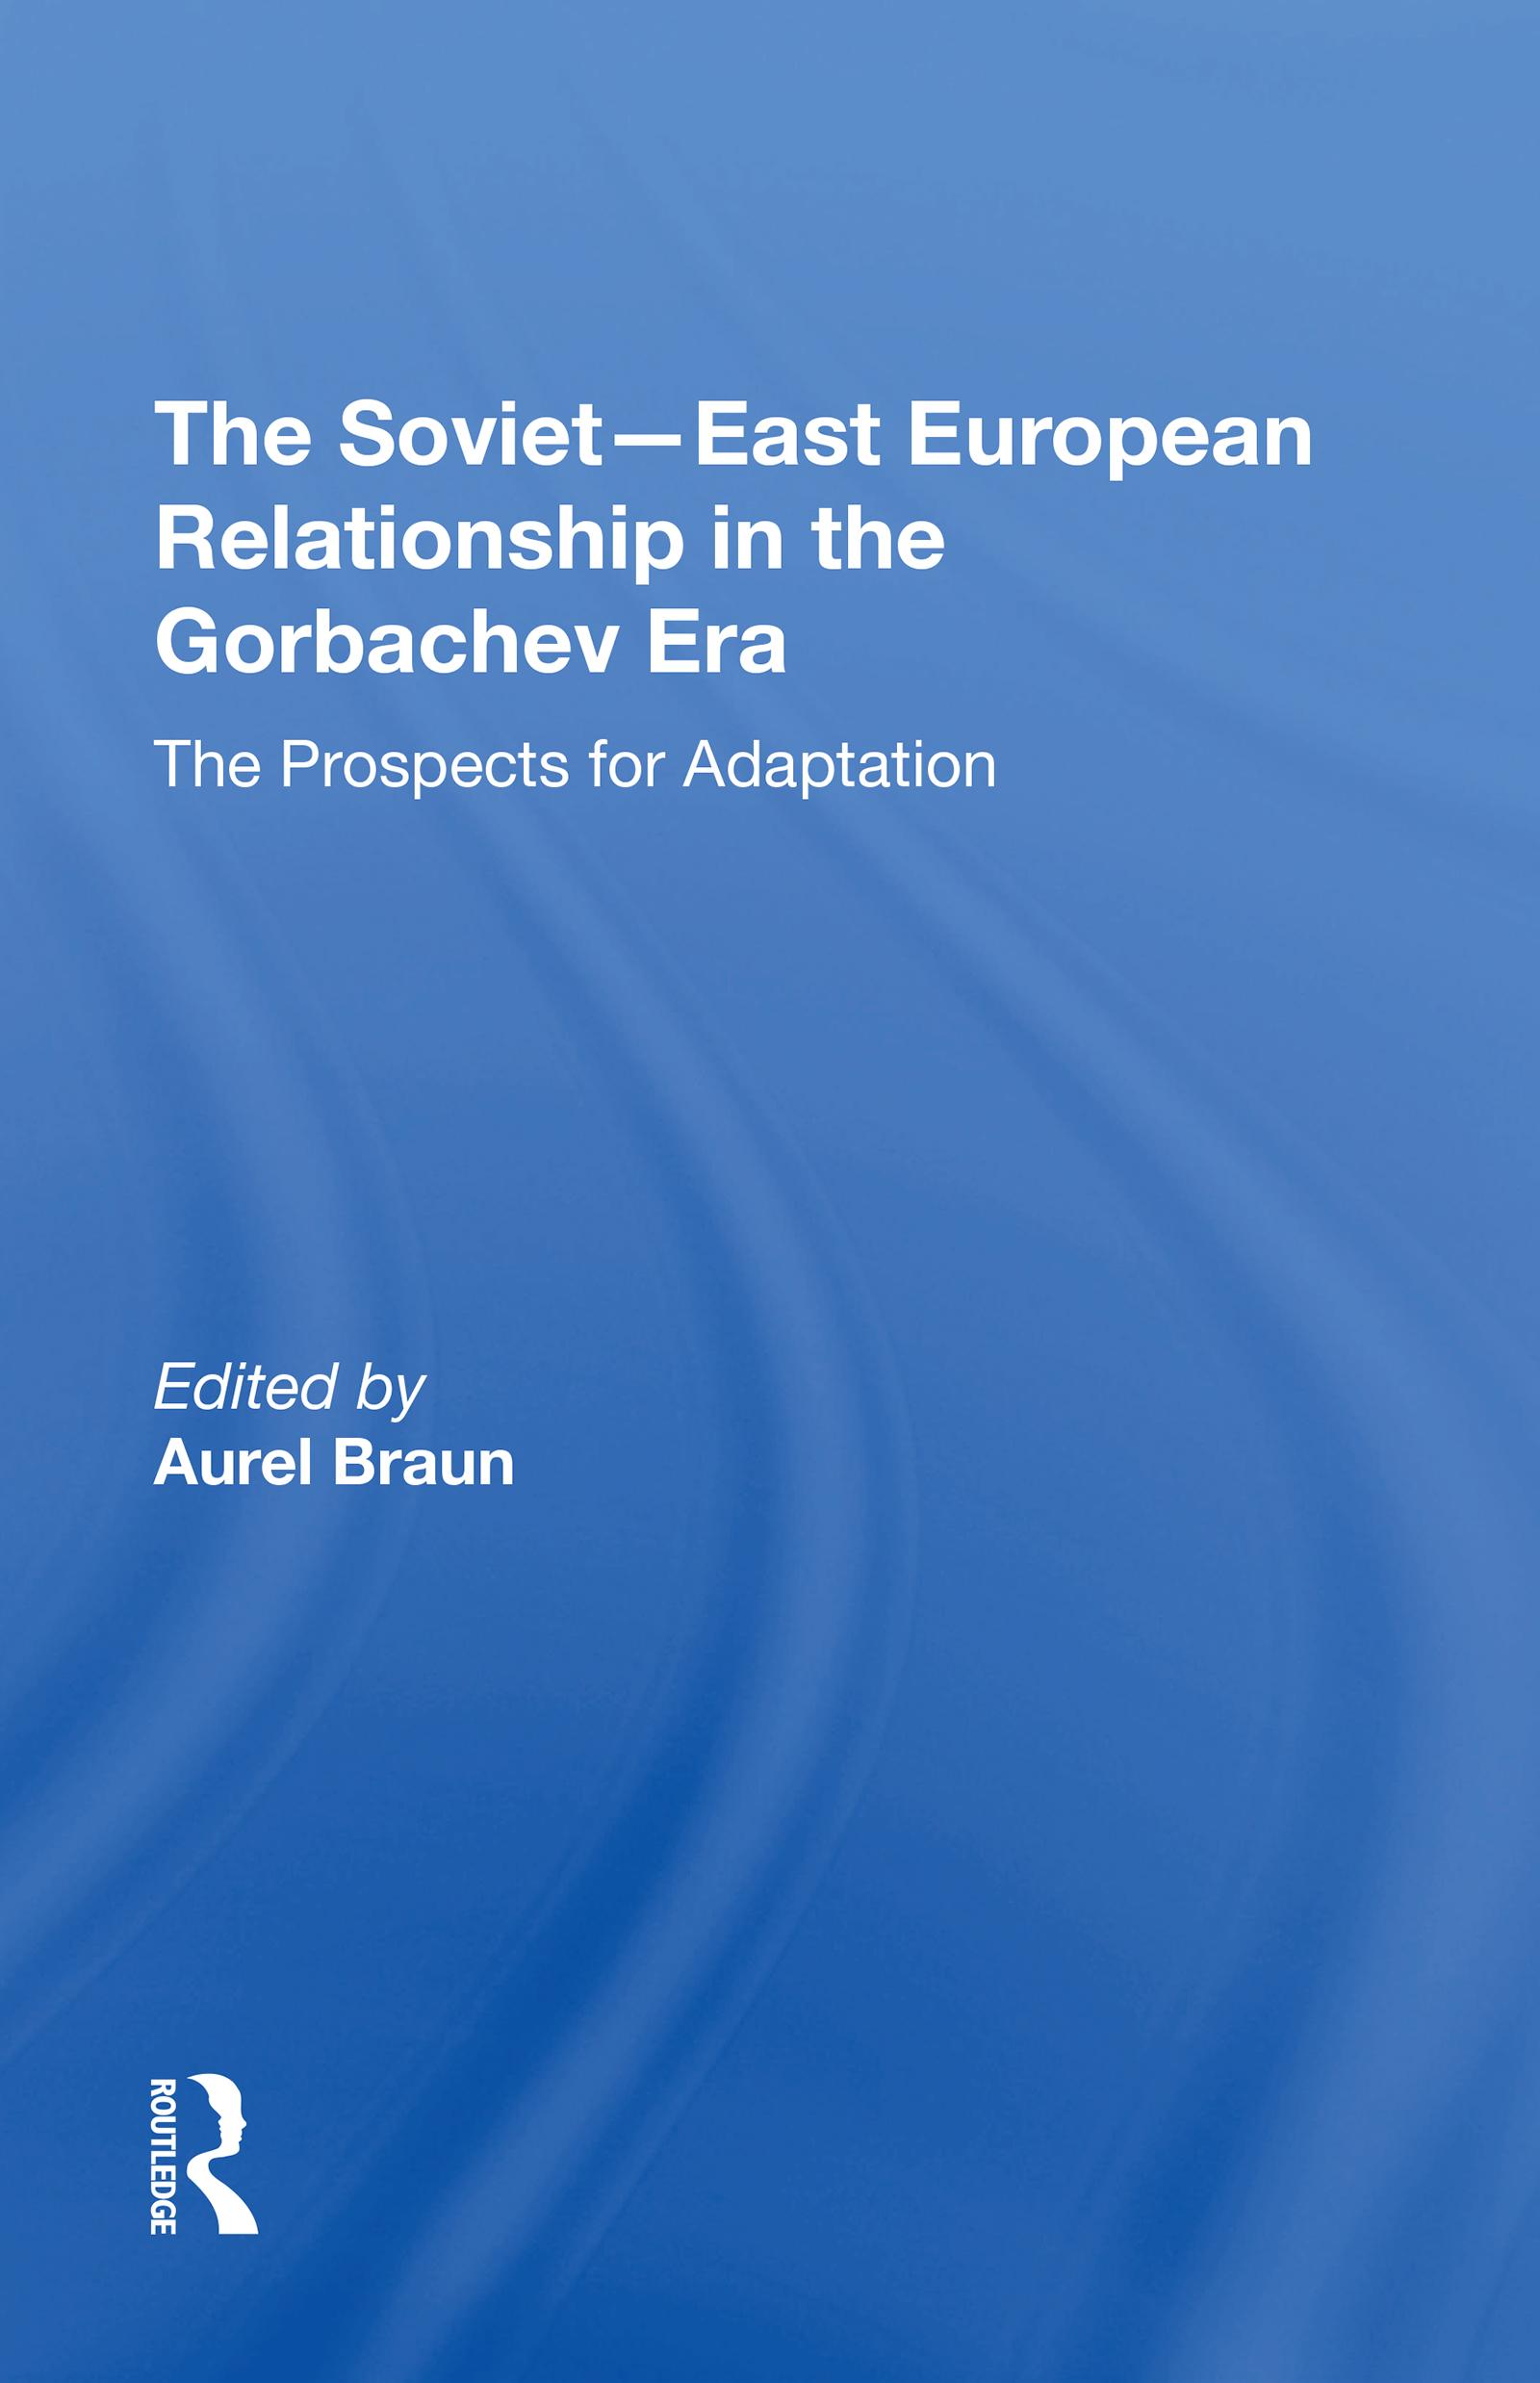 The Soviet-East European Relationship In The Gorbachev Era